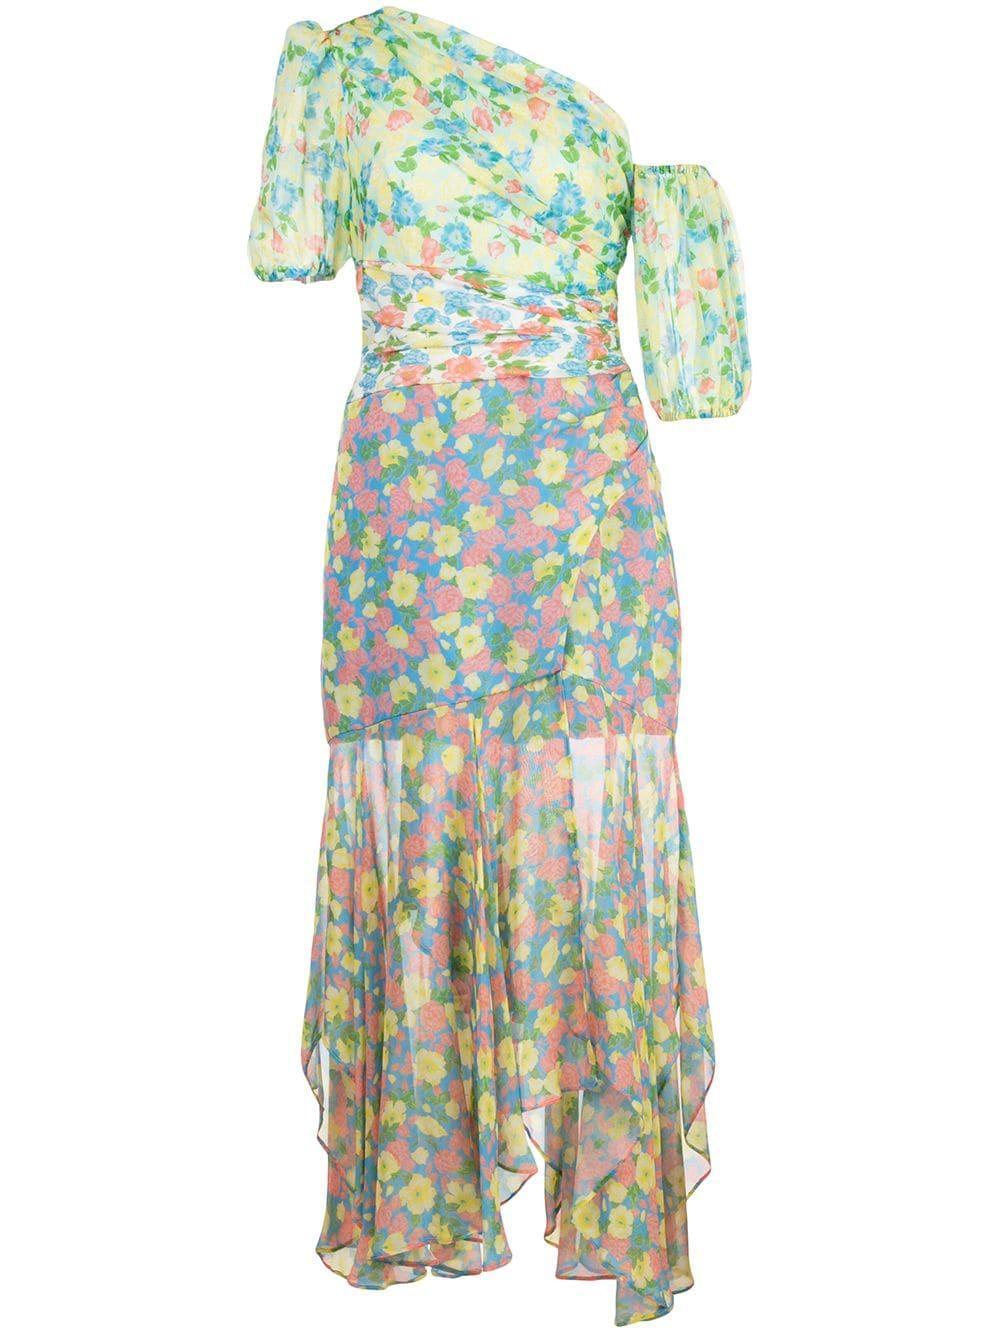 Jaylah One Shoulder Midi Dress Item # 5812376